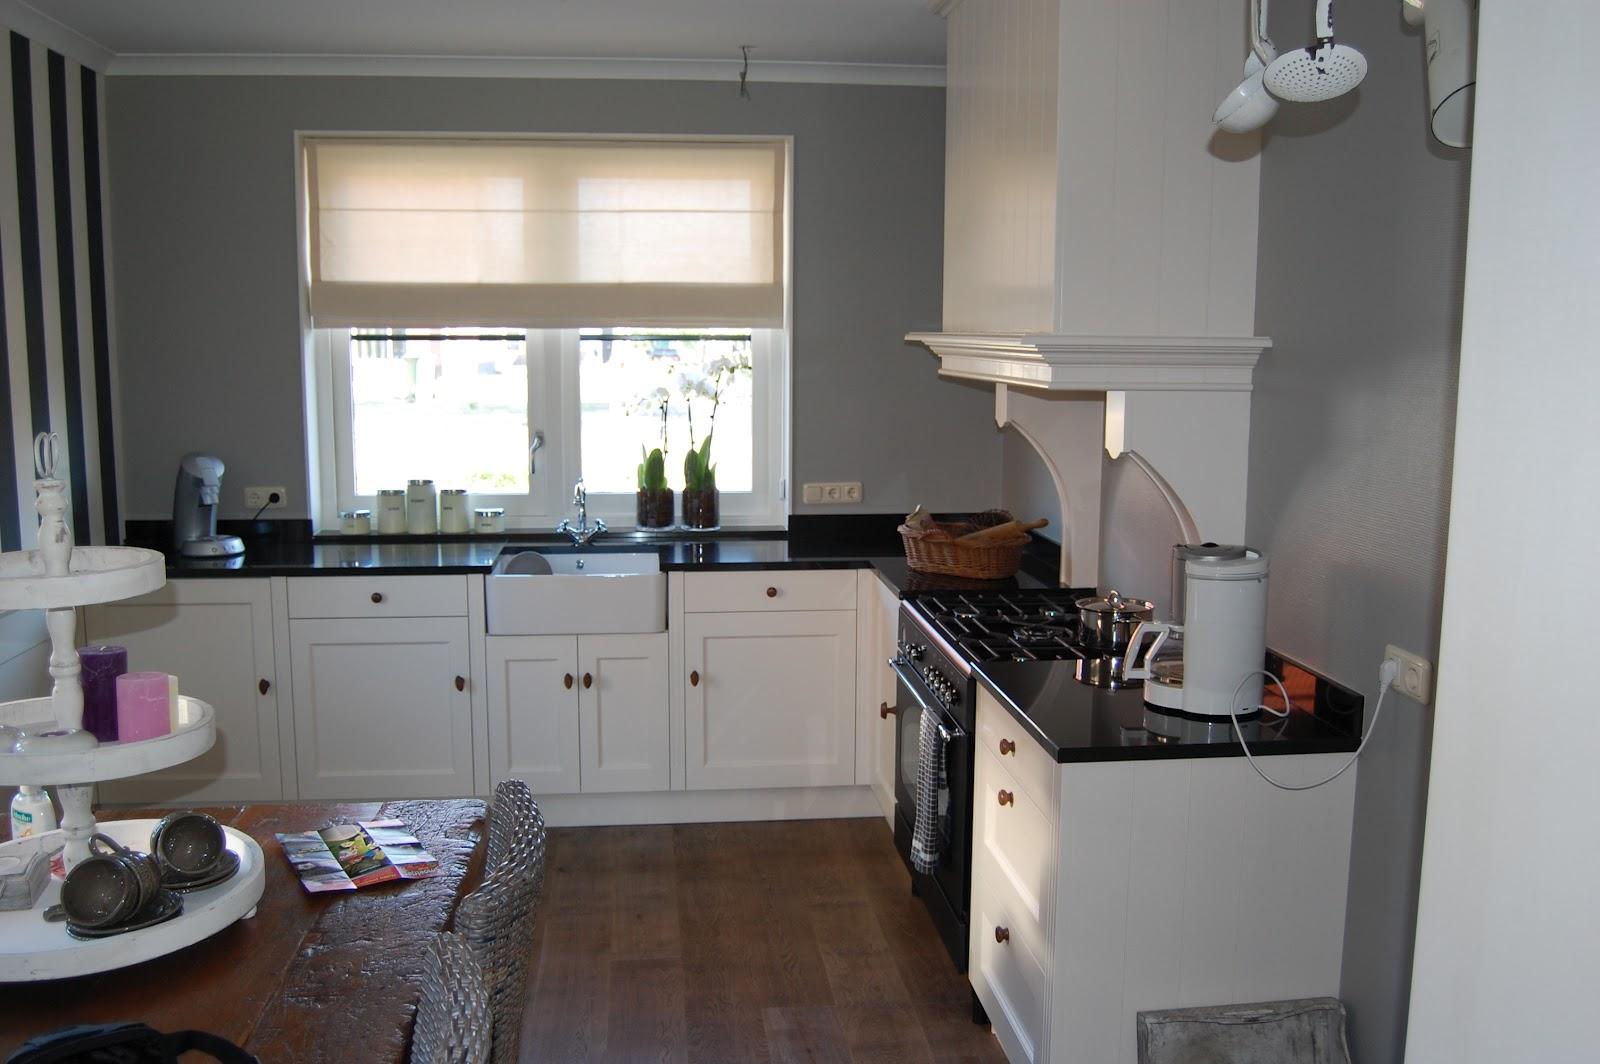 Moois en liefs keukens - Keuken rode en grijze muur ...